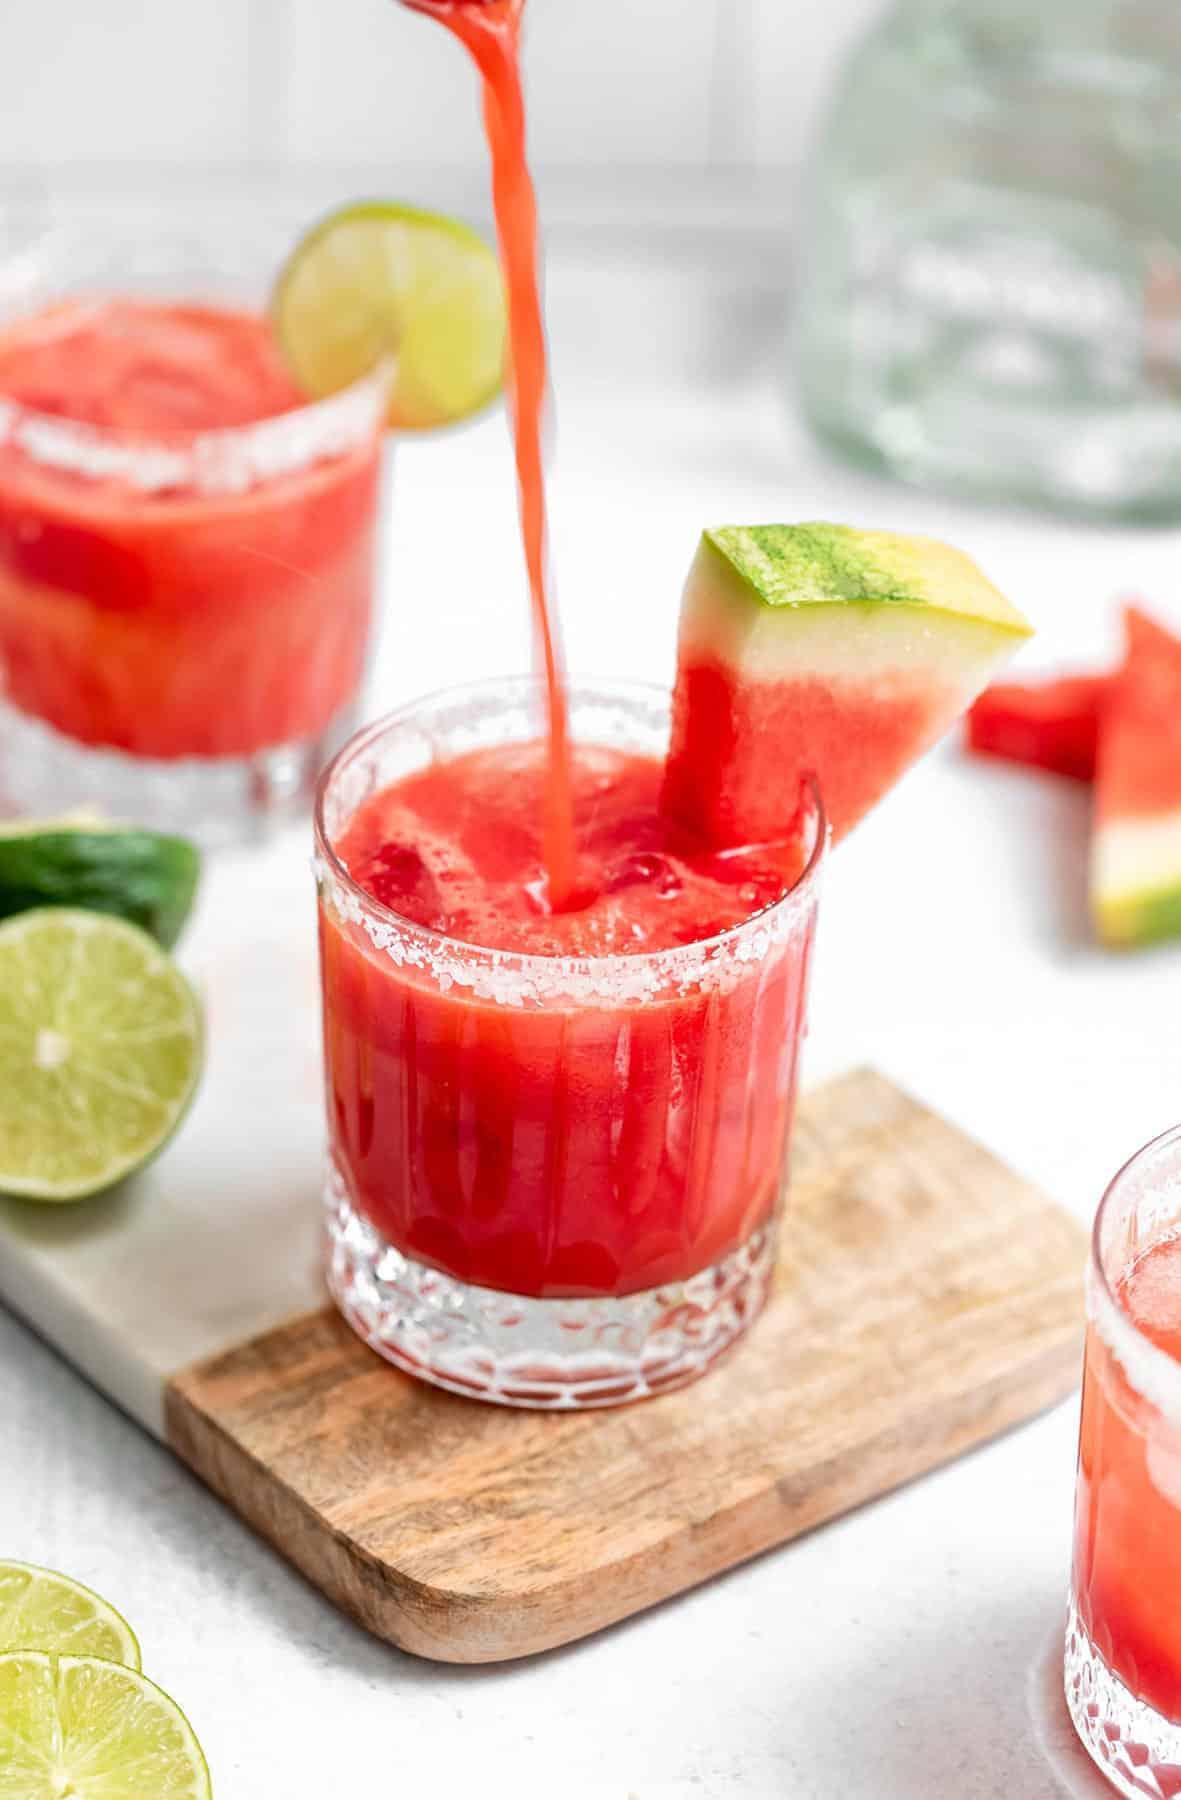 pouring the watermelon margarita into glasses